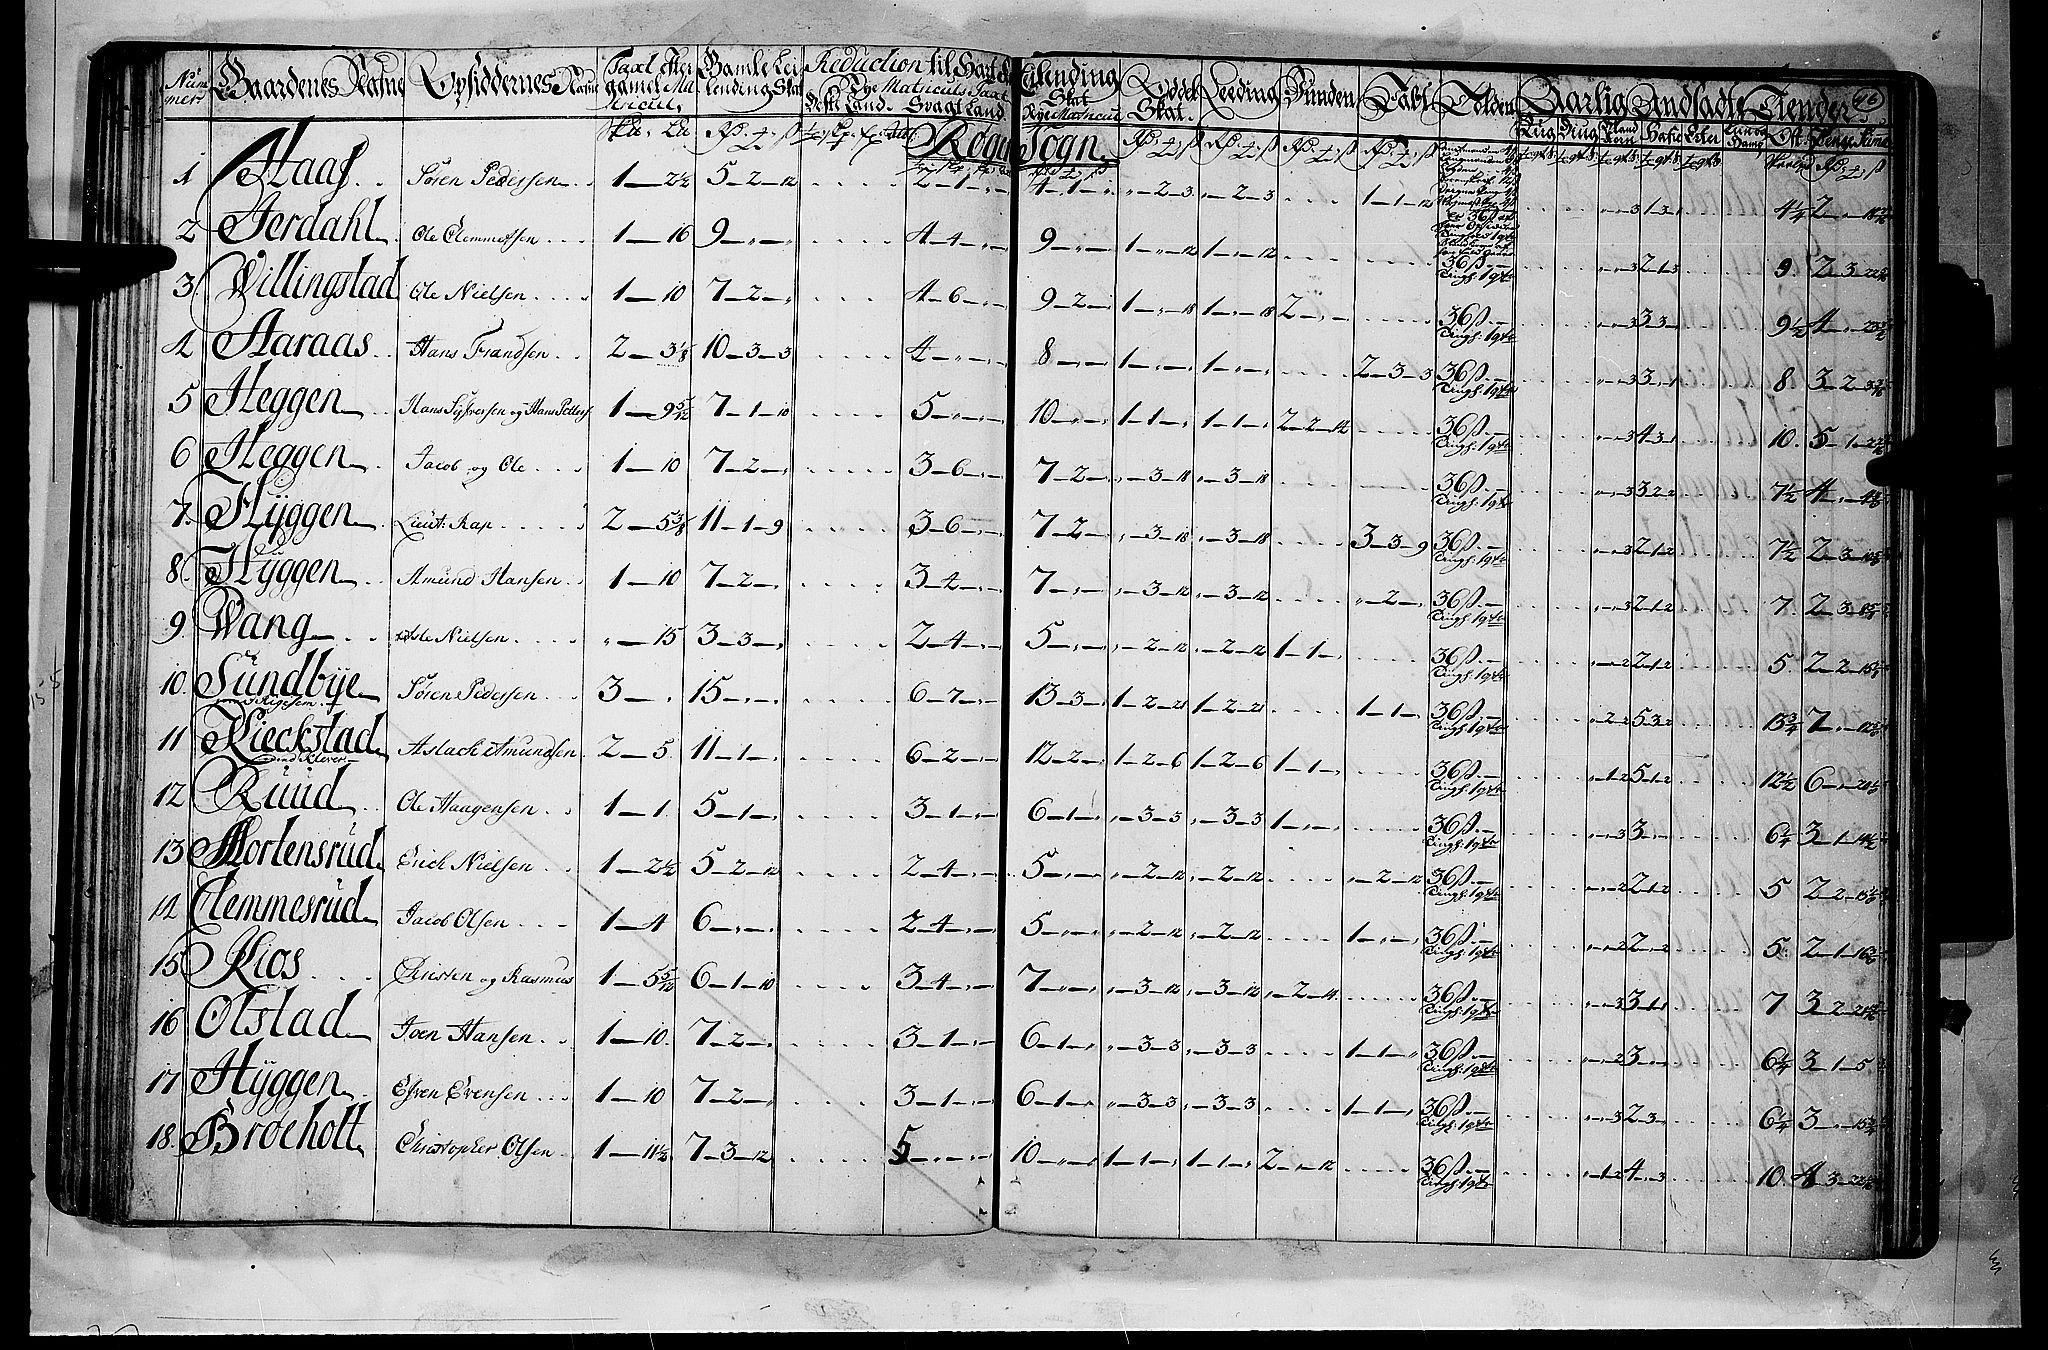 RA, Rentekammeret inntil 1814, Realistisk ordnet avdeling, N/Nb/Nbf/L0112: Buskerud matrikkelprotokoll, 1723, p. 48